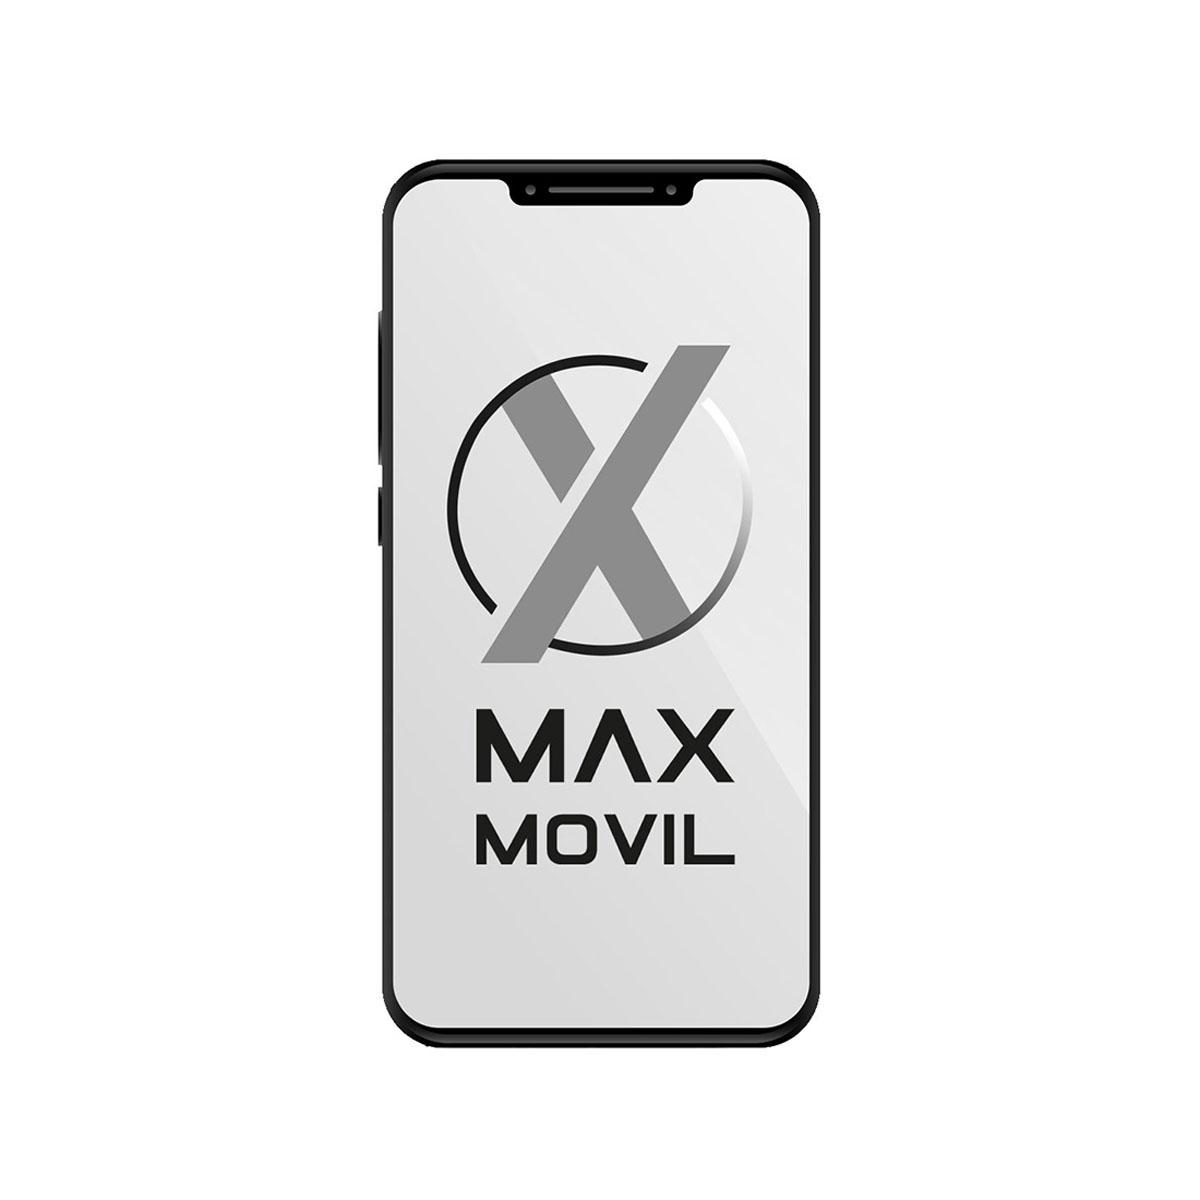 e0890517197 Características del LG G3 S libre de color dorado · MaxMovil ⓴⓳